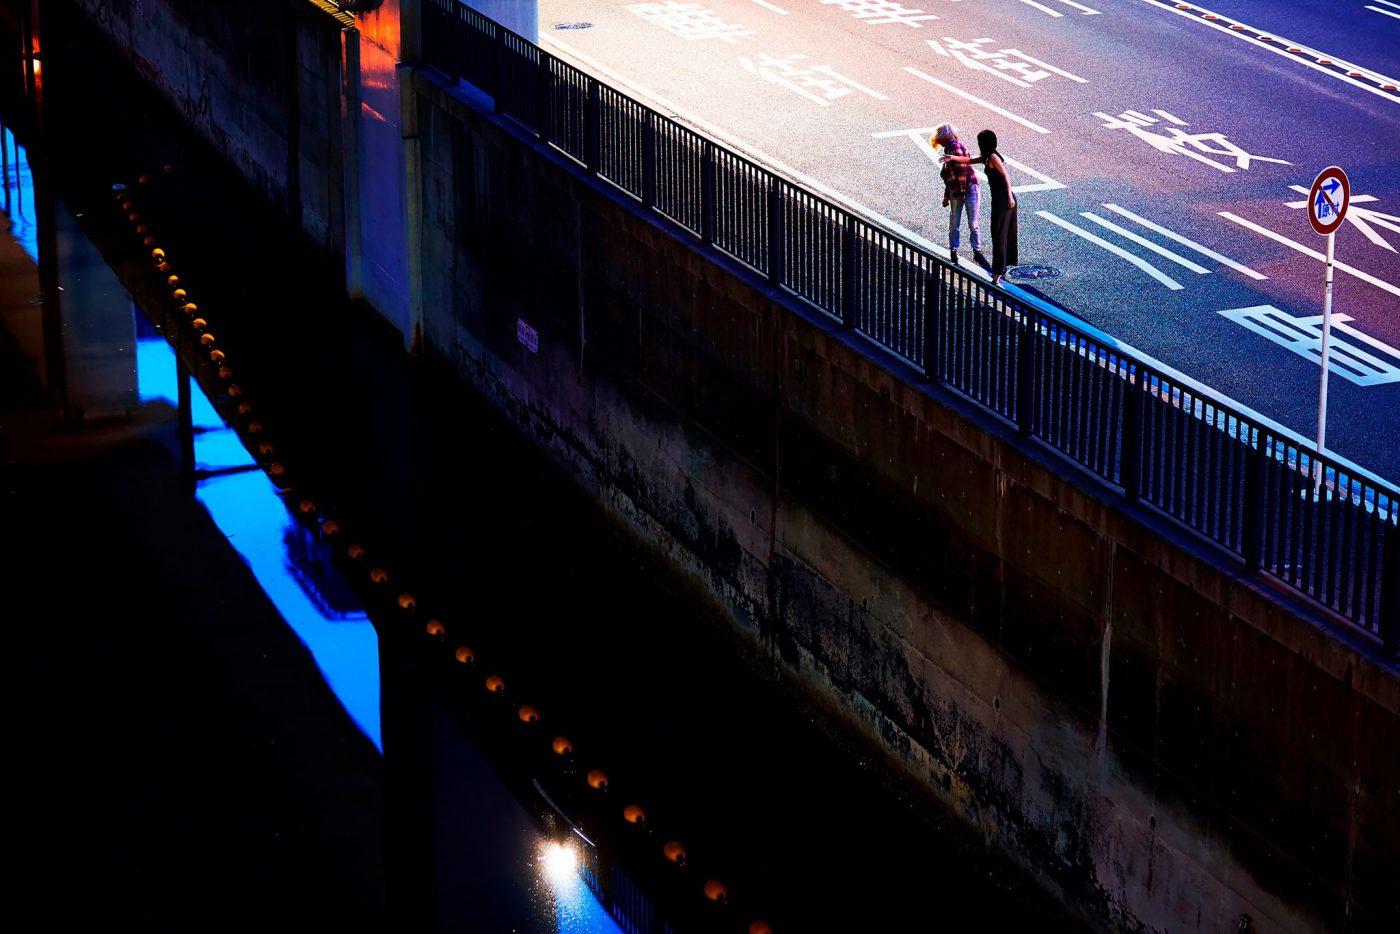 The Rolls of Dice - Japanischer Fotograf Kazunori Nagashima